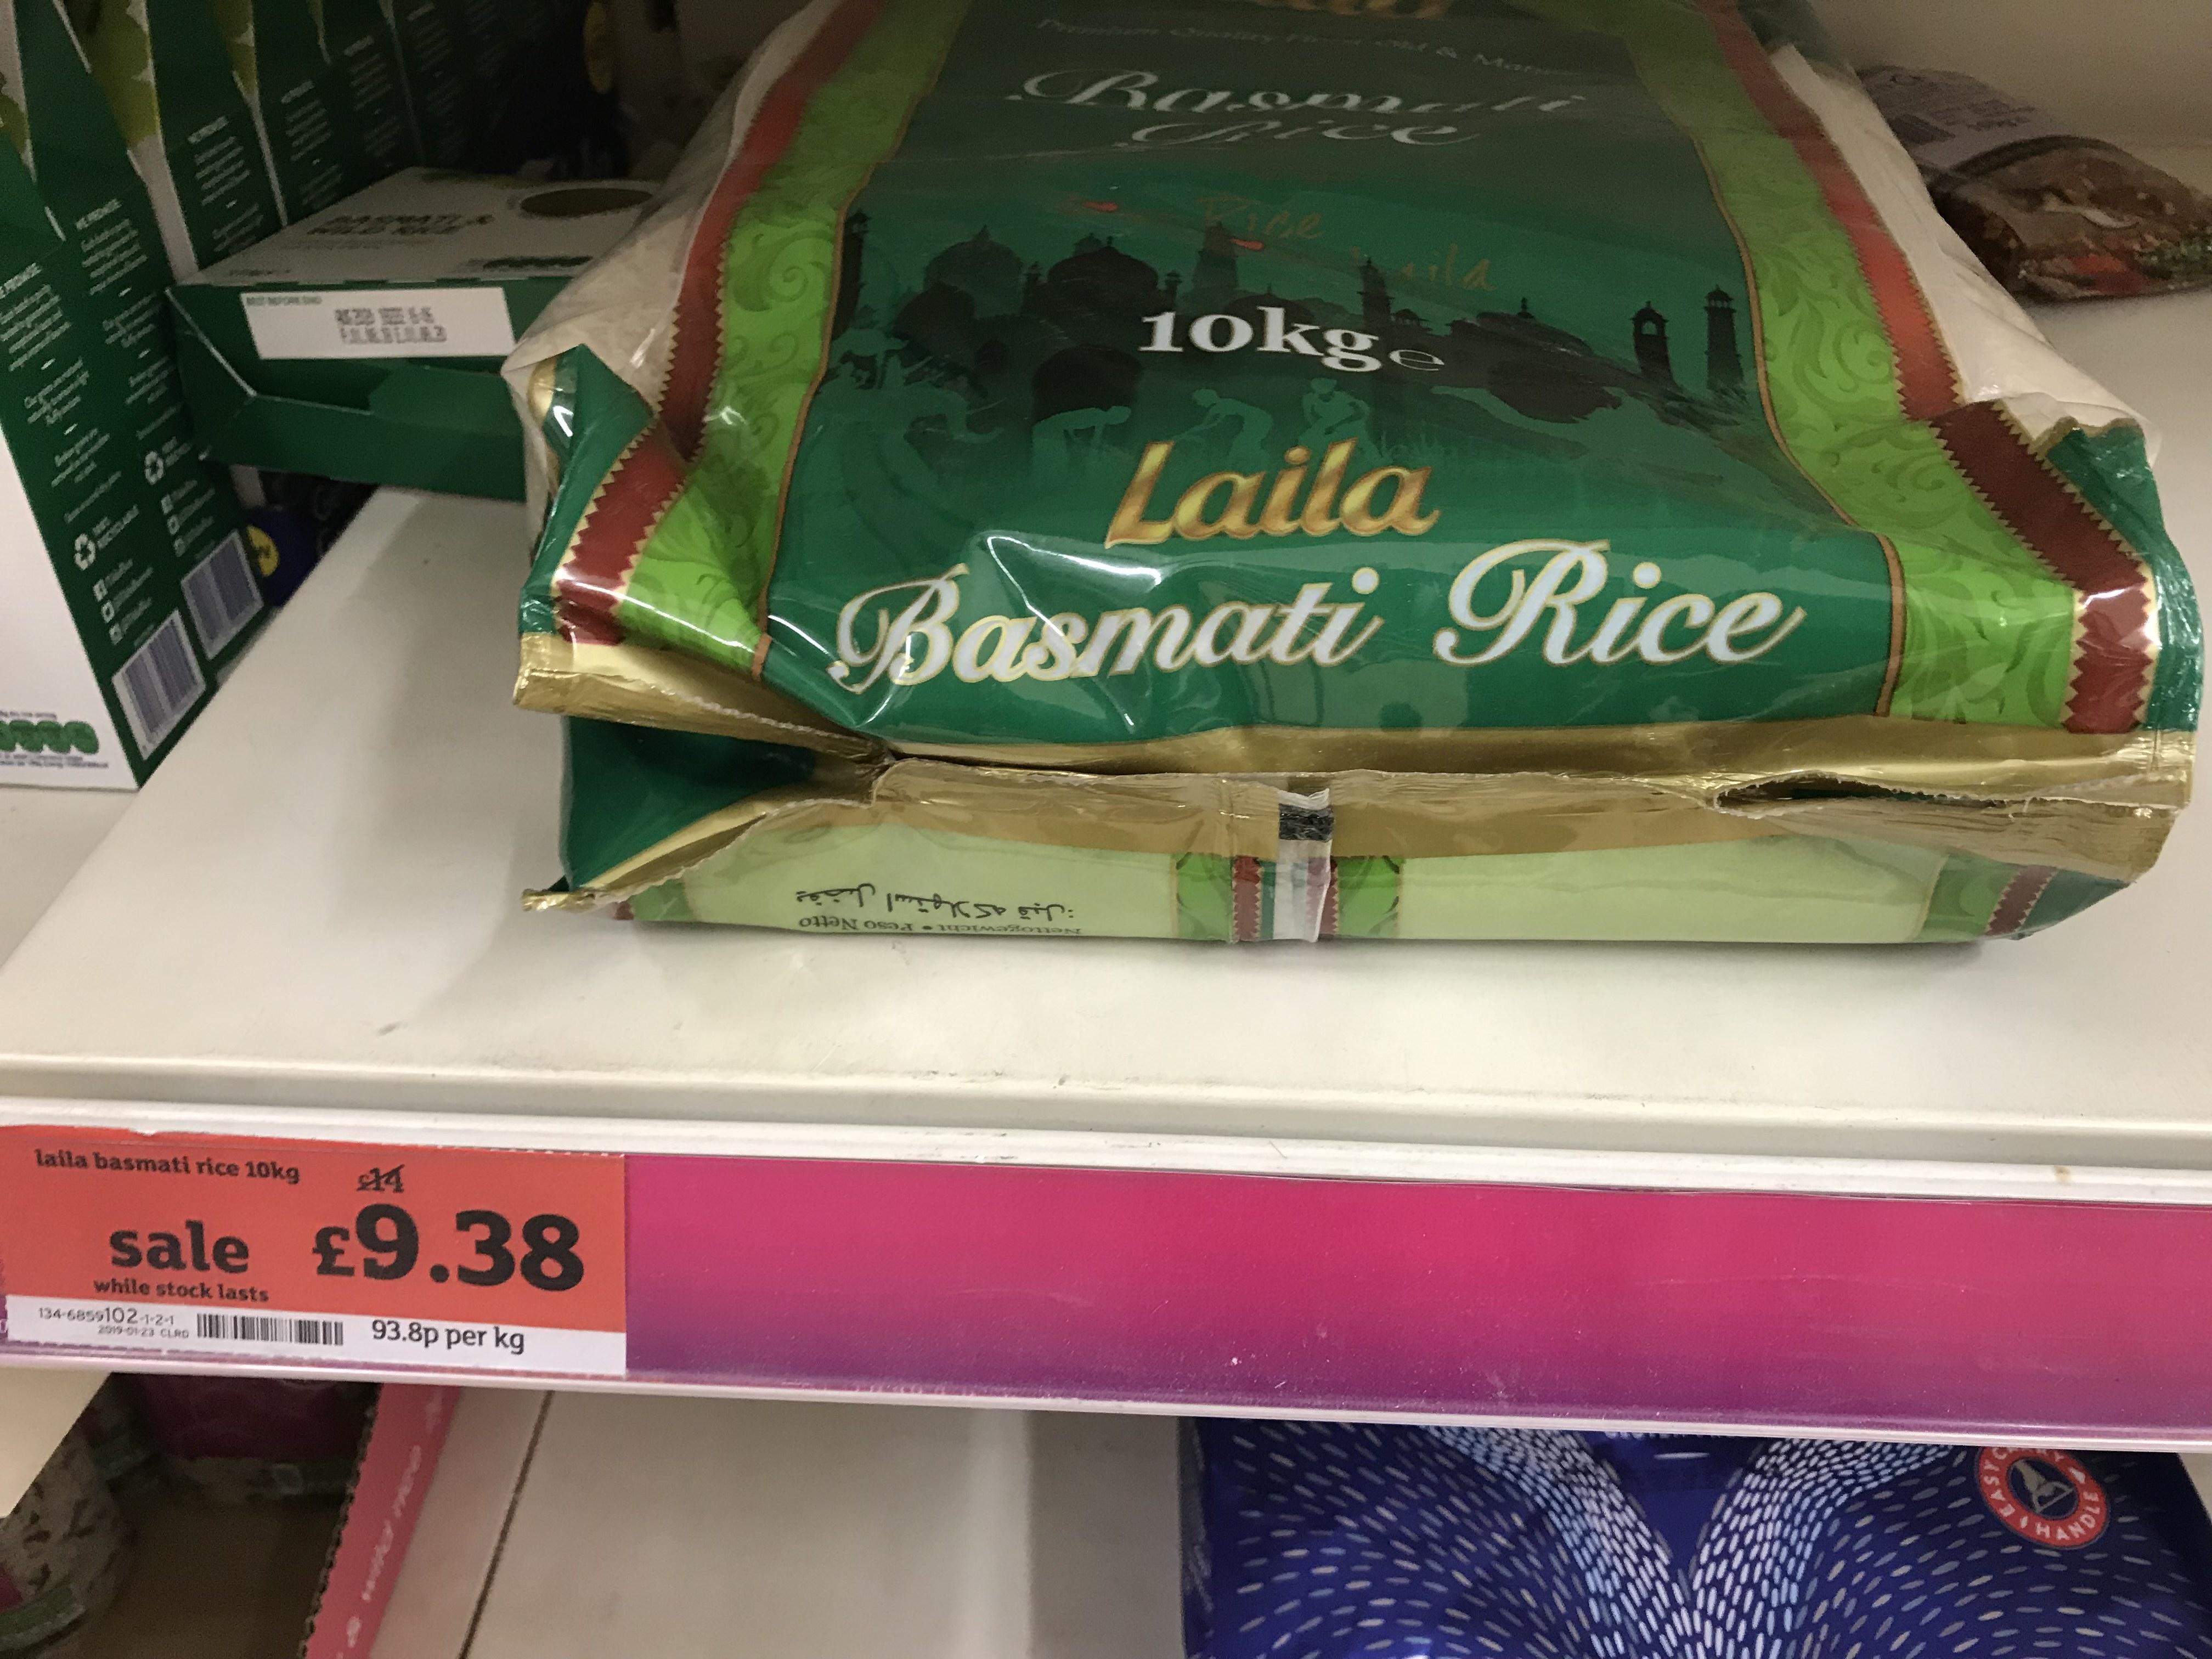 Laila basmati rice £9.38 in Sainsbury's instore